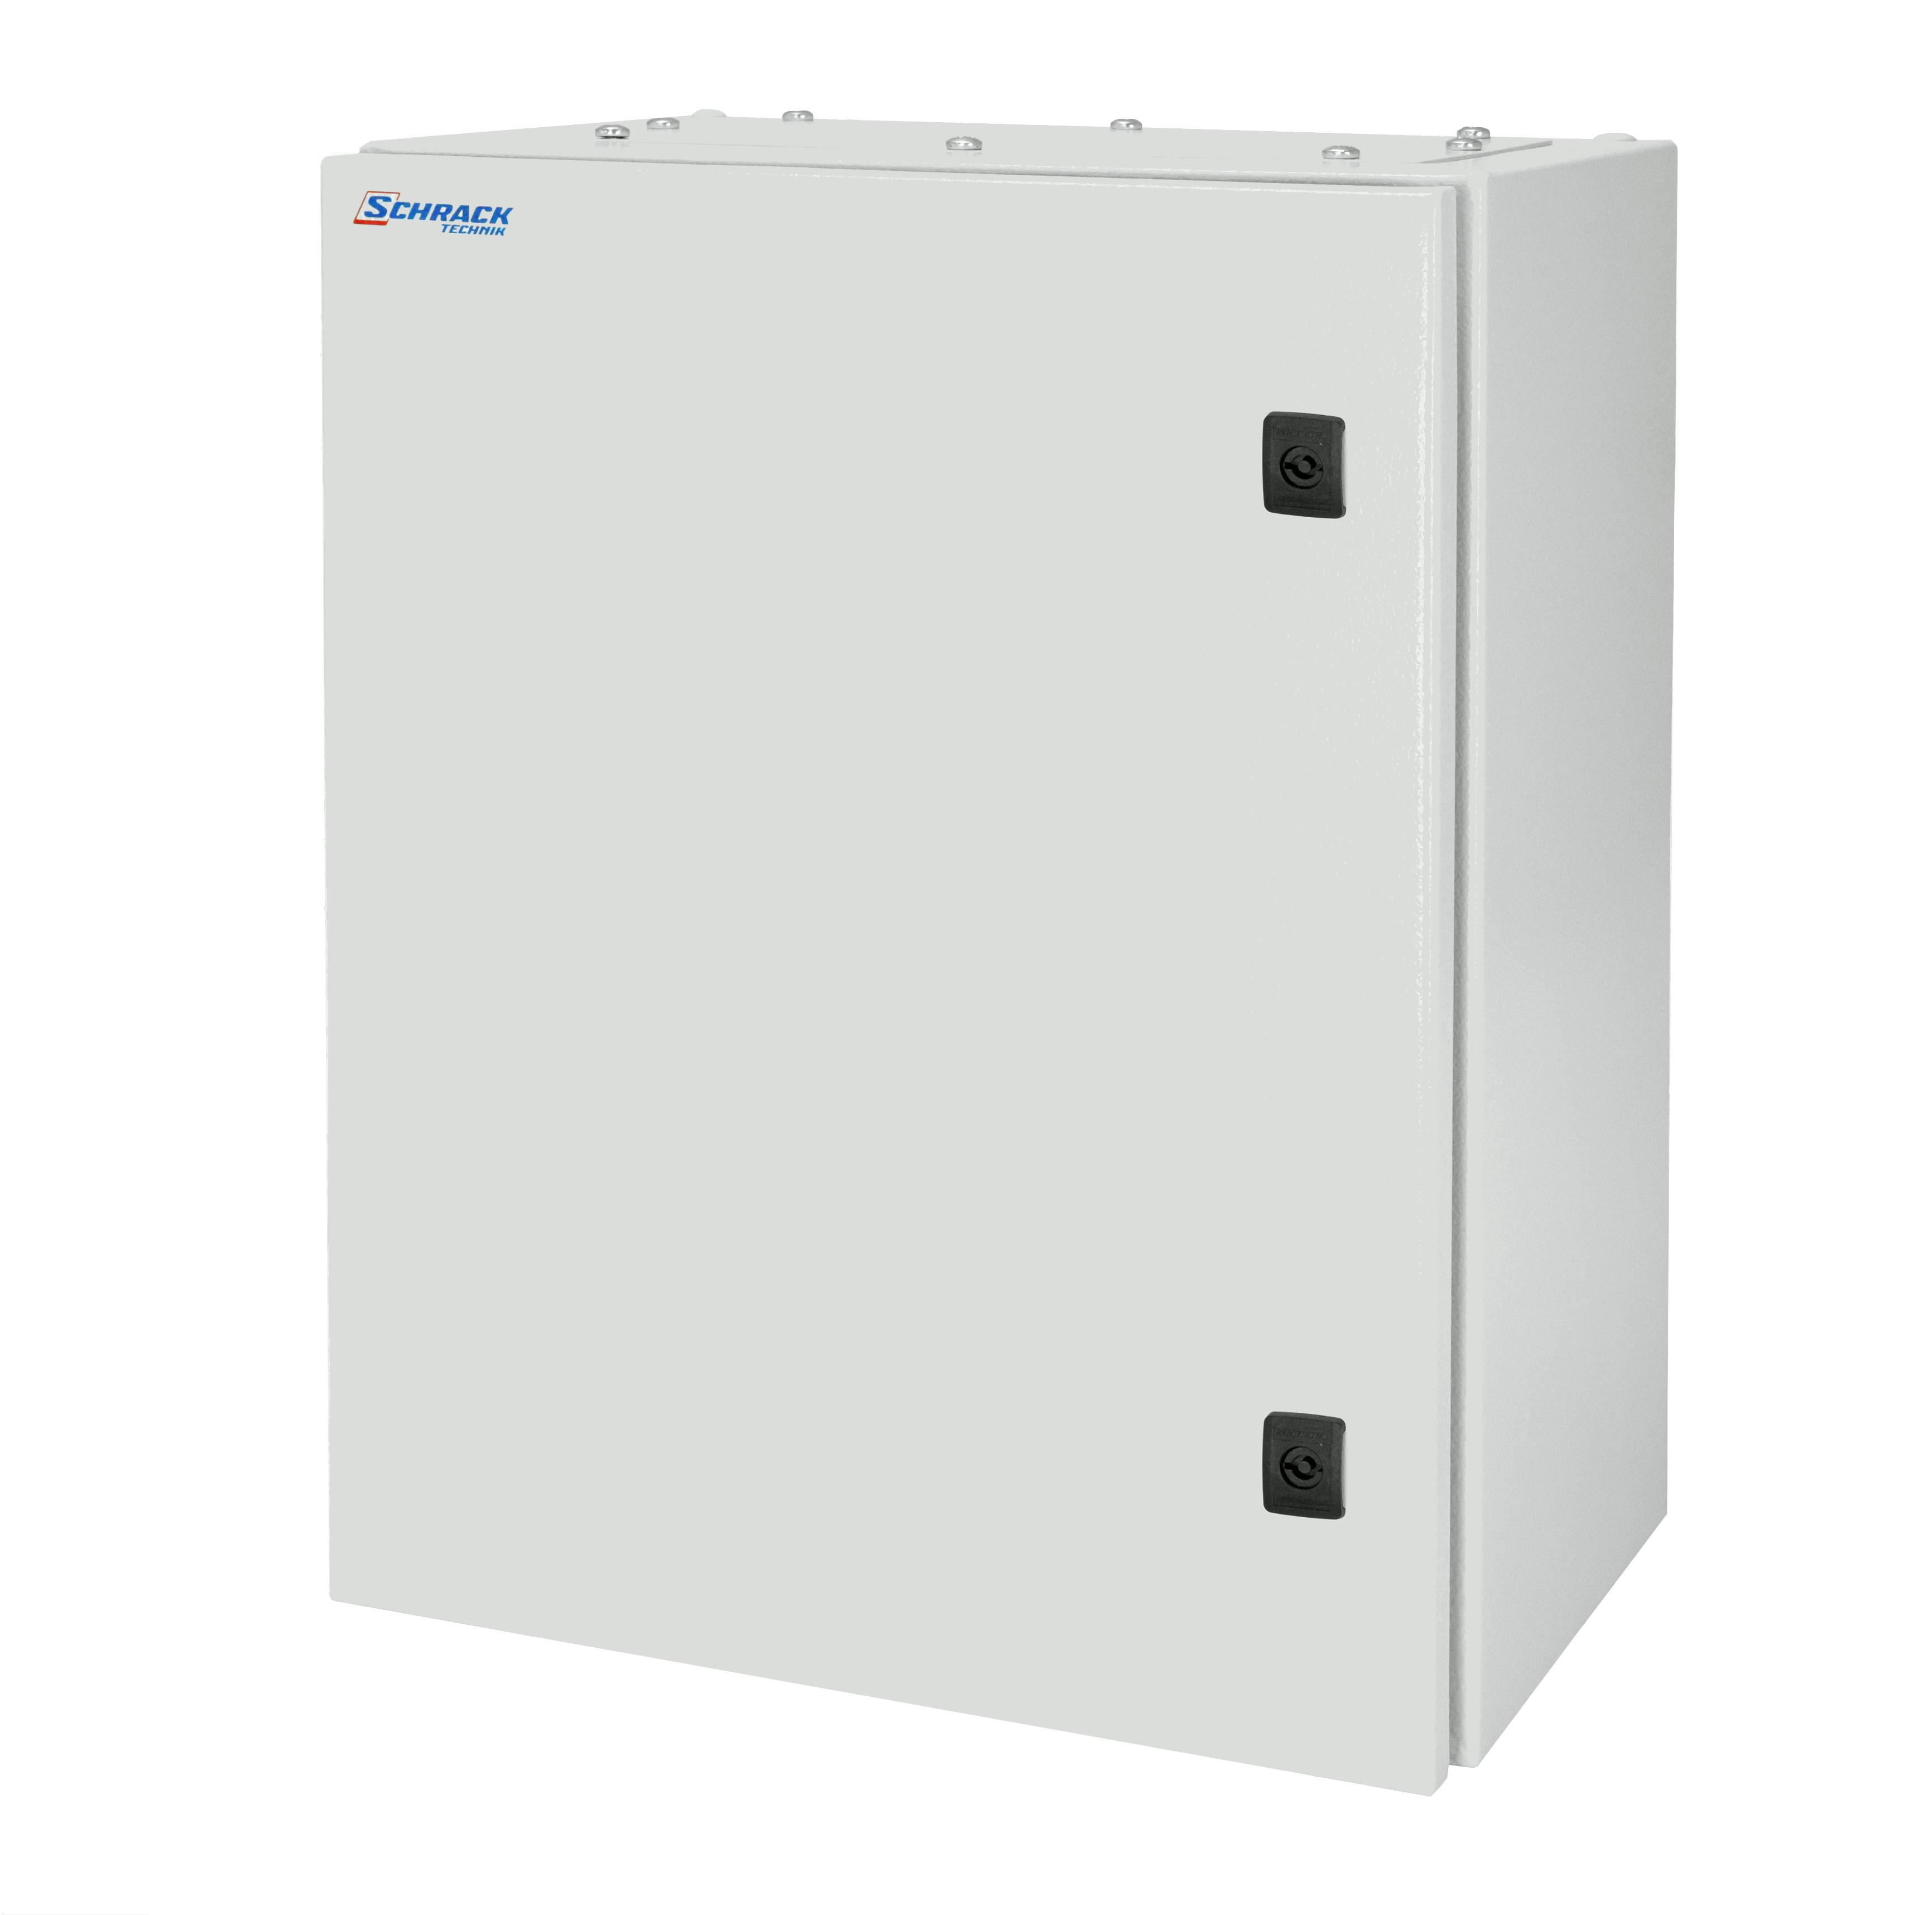 1 Stk Wandschrank Mono IP66 H=600 B=800 T=300 Stahlblech WSM6080300